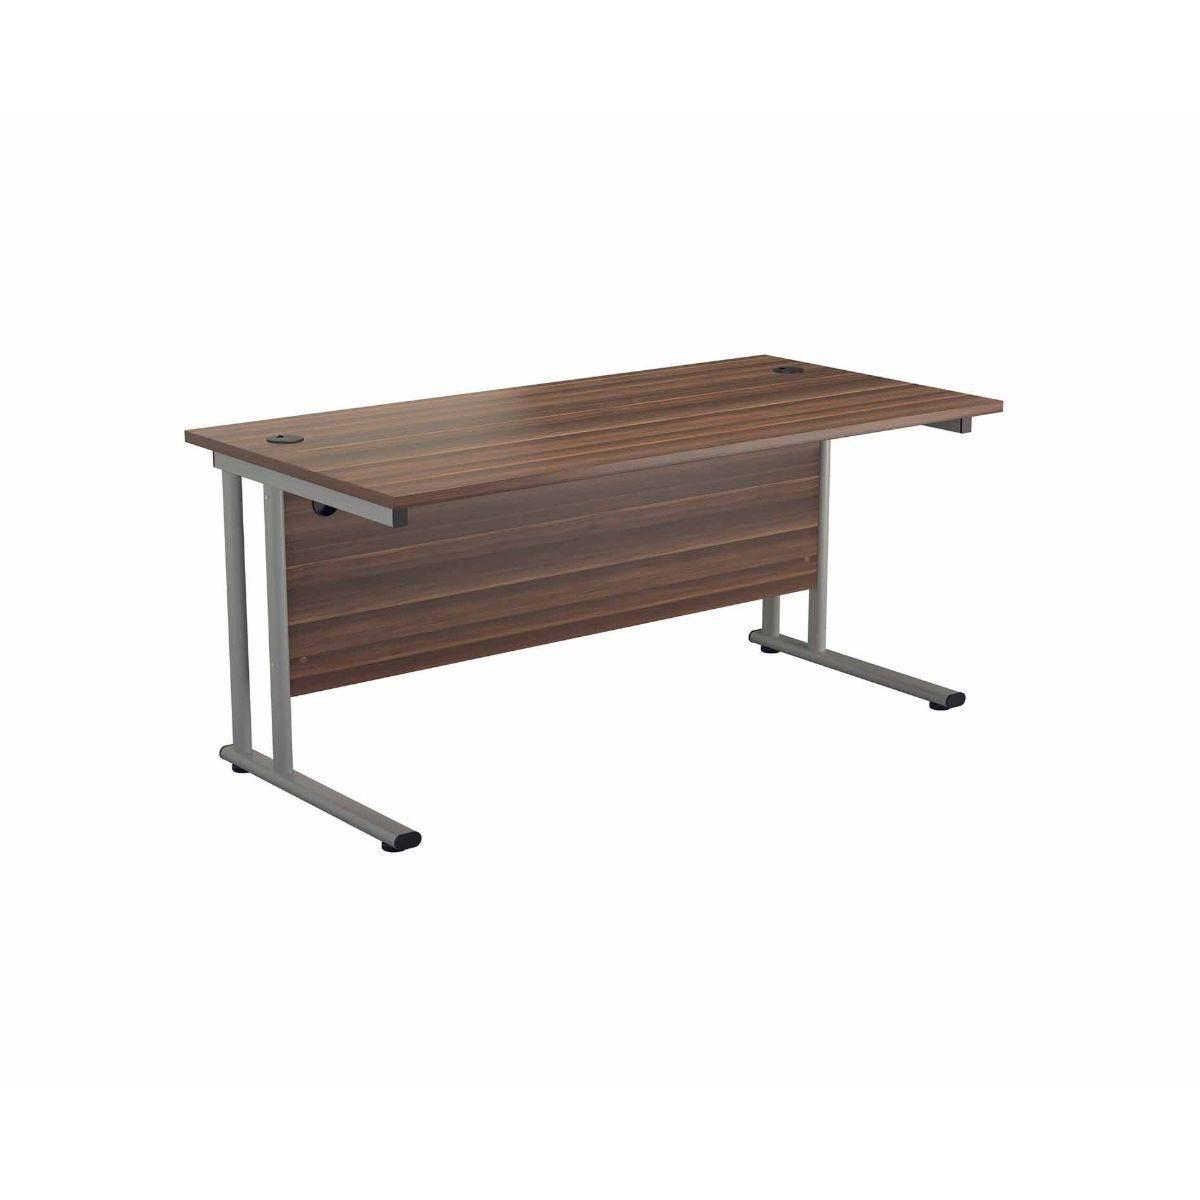 TC Office Start Silver Cantilever Frame Desk 1600x800mm Dark Walnut